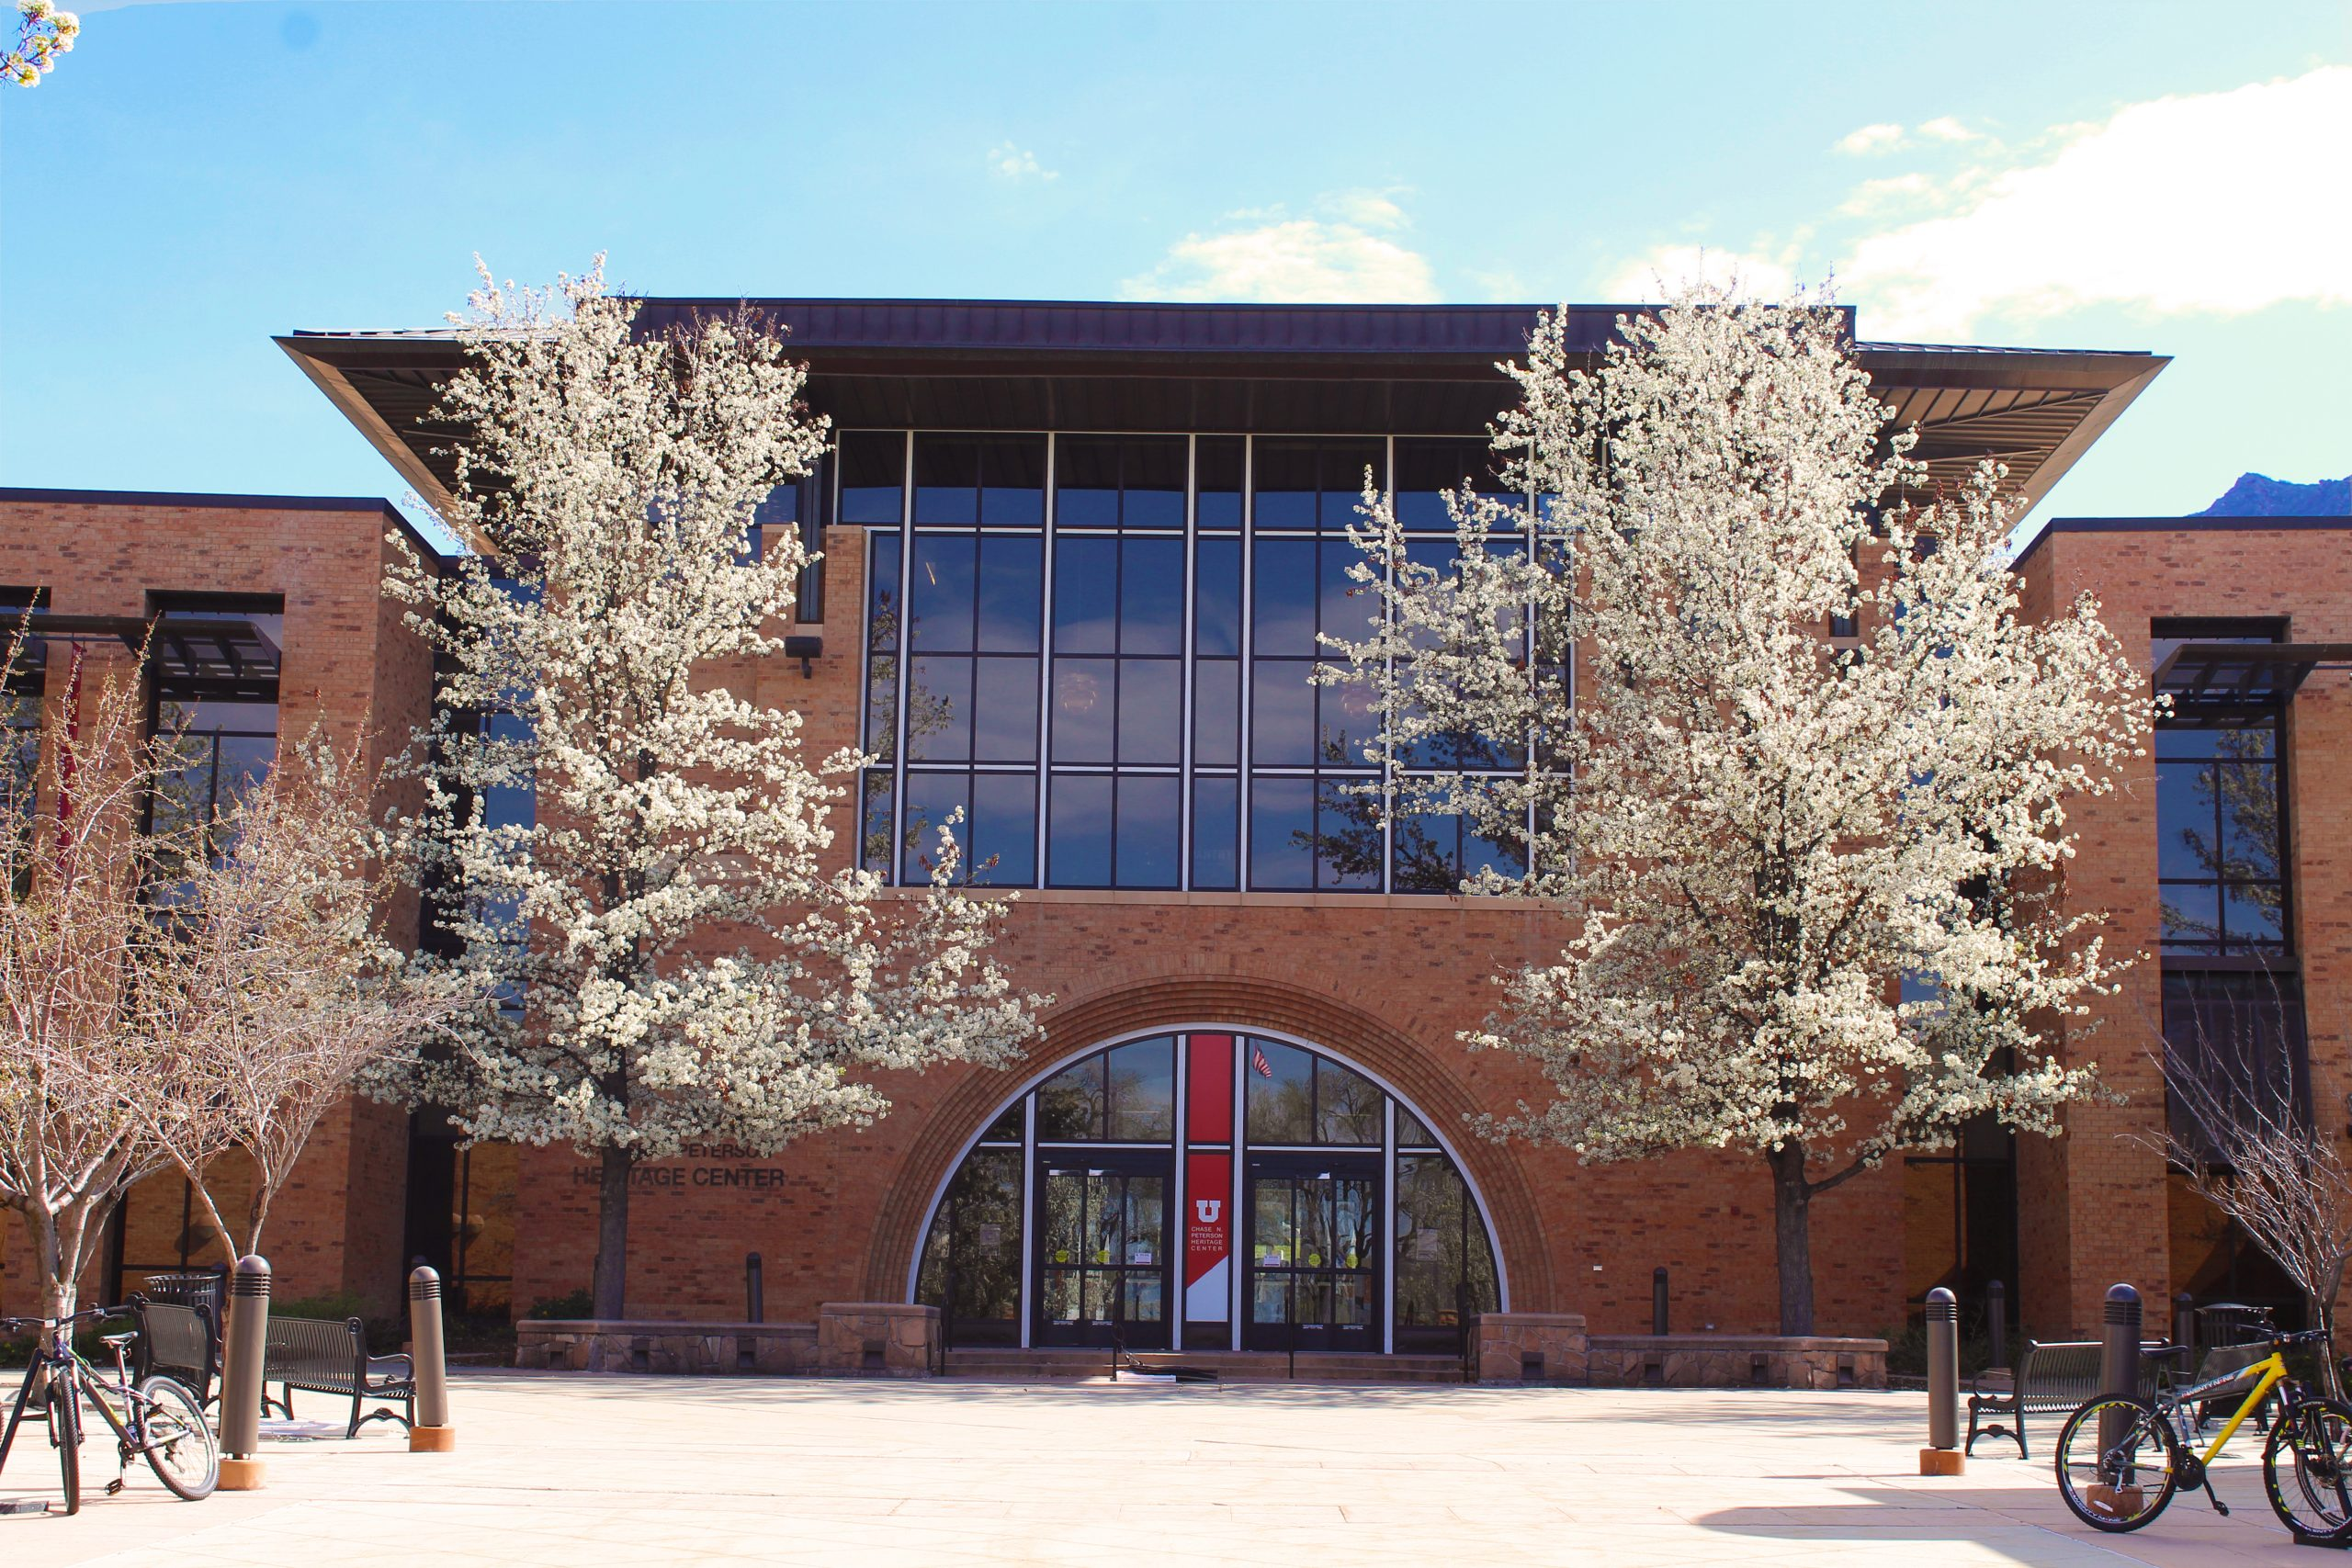 Heritage Center spring 2020